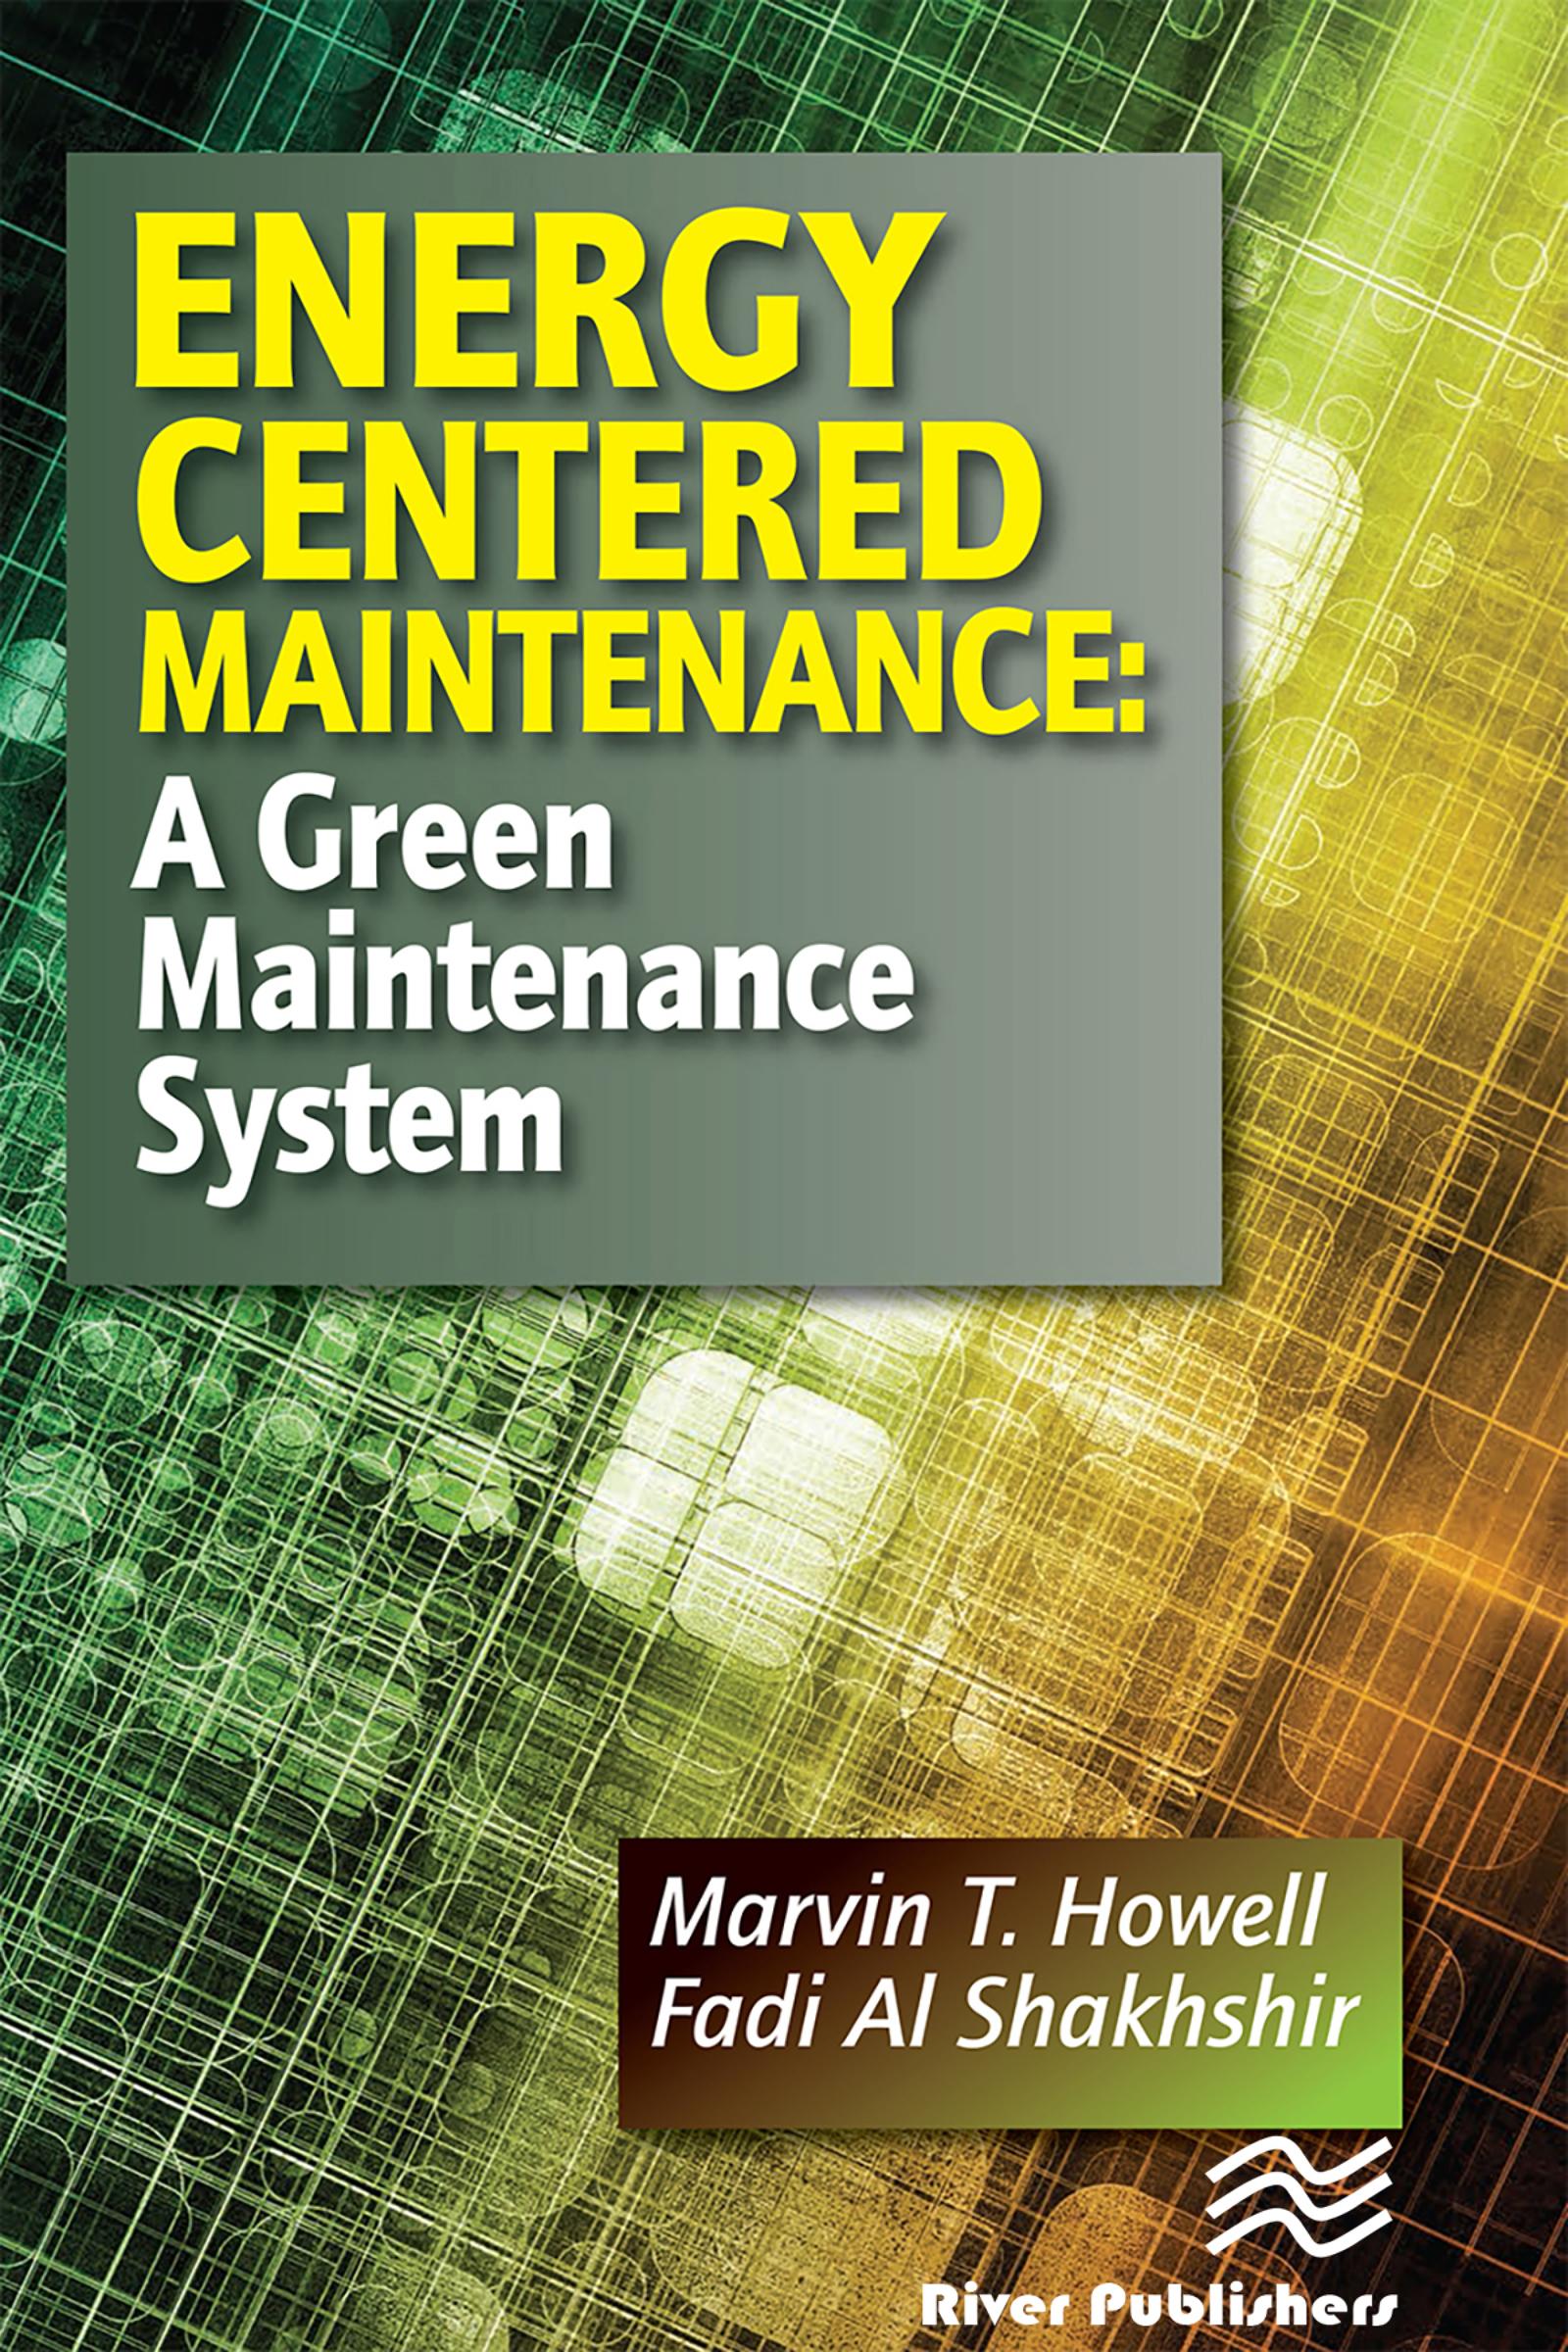 Energy Centered Maintenance—A Green Maintenance System